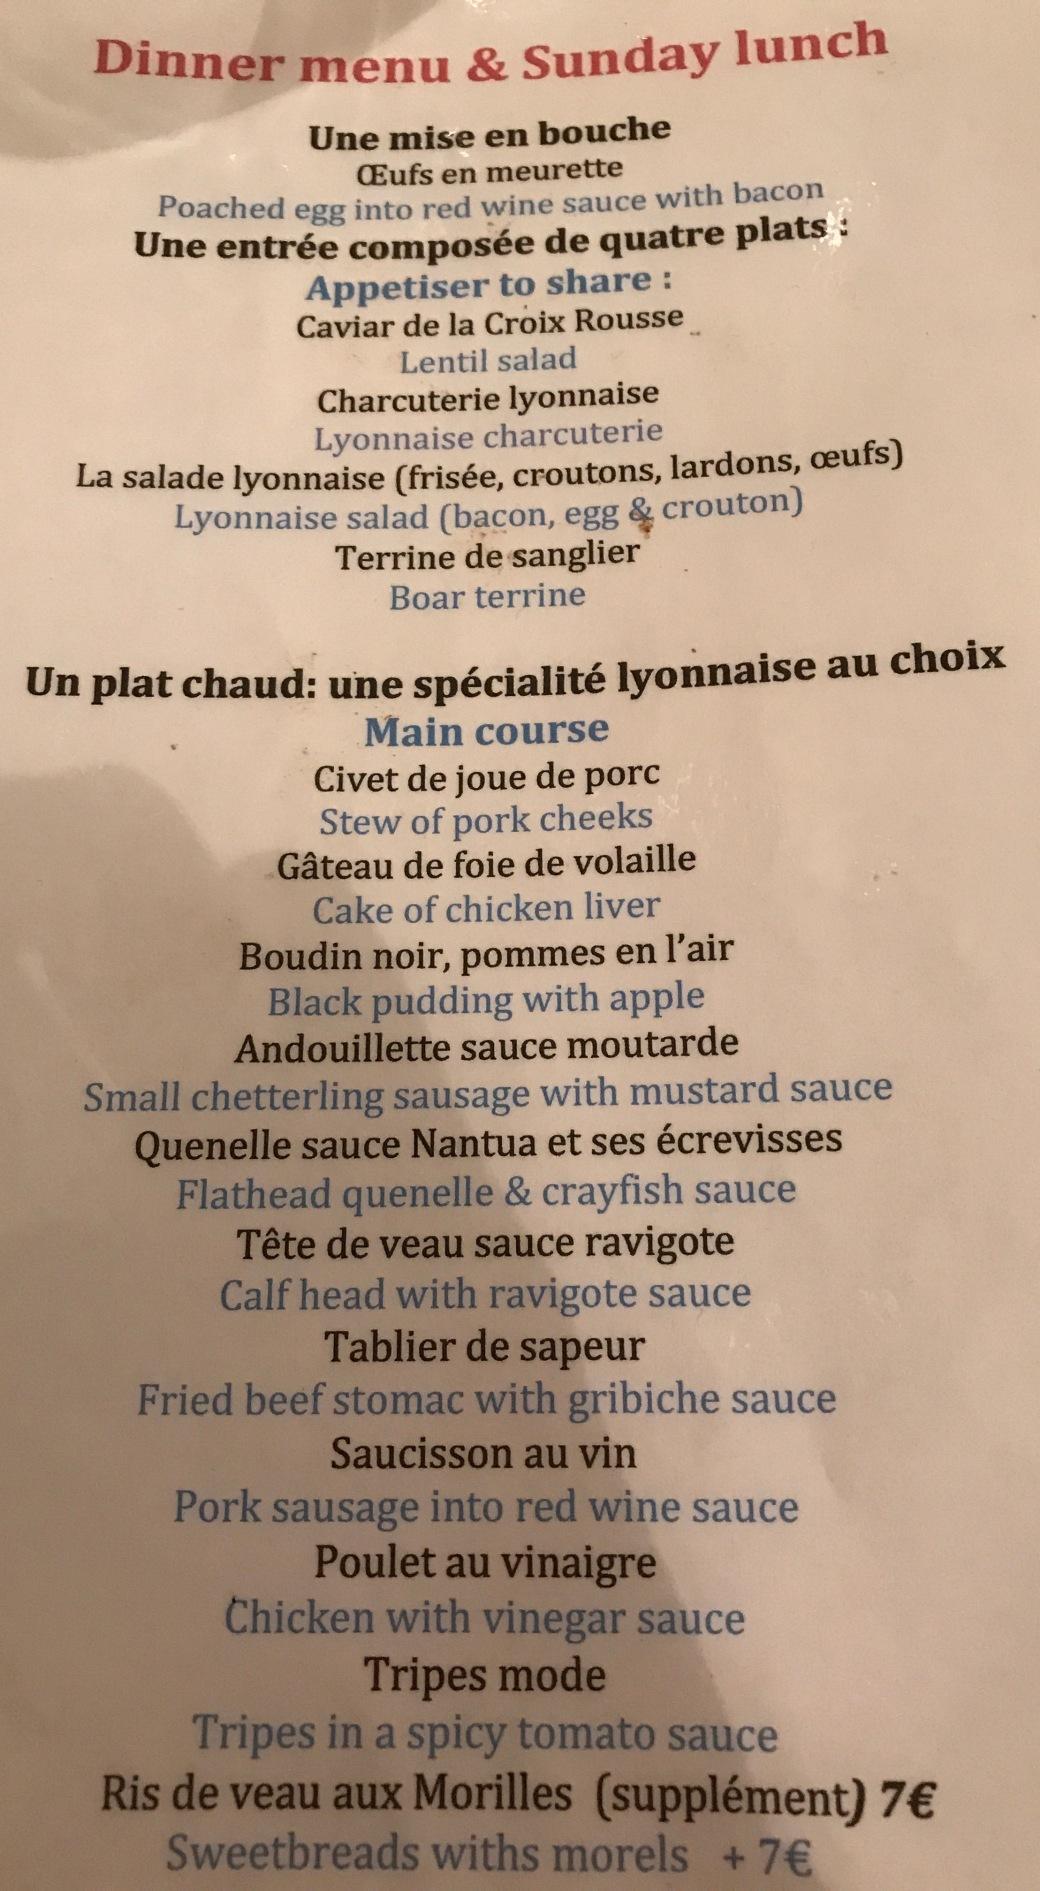 fed menu